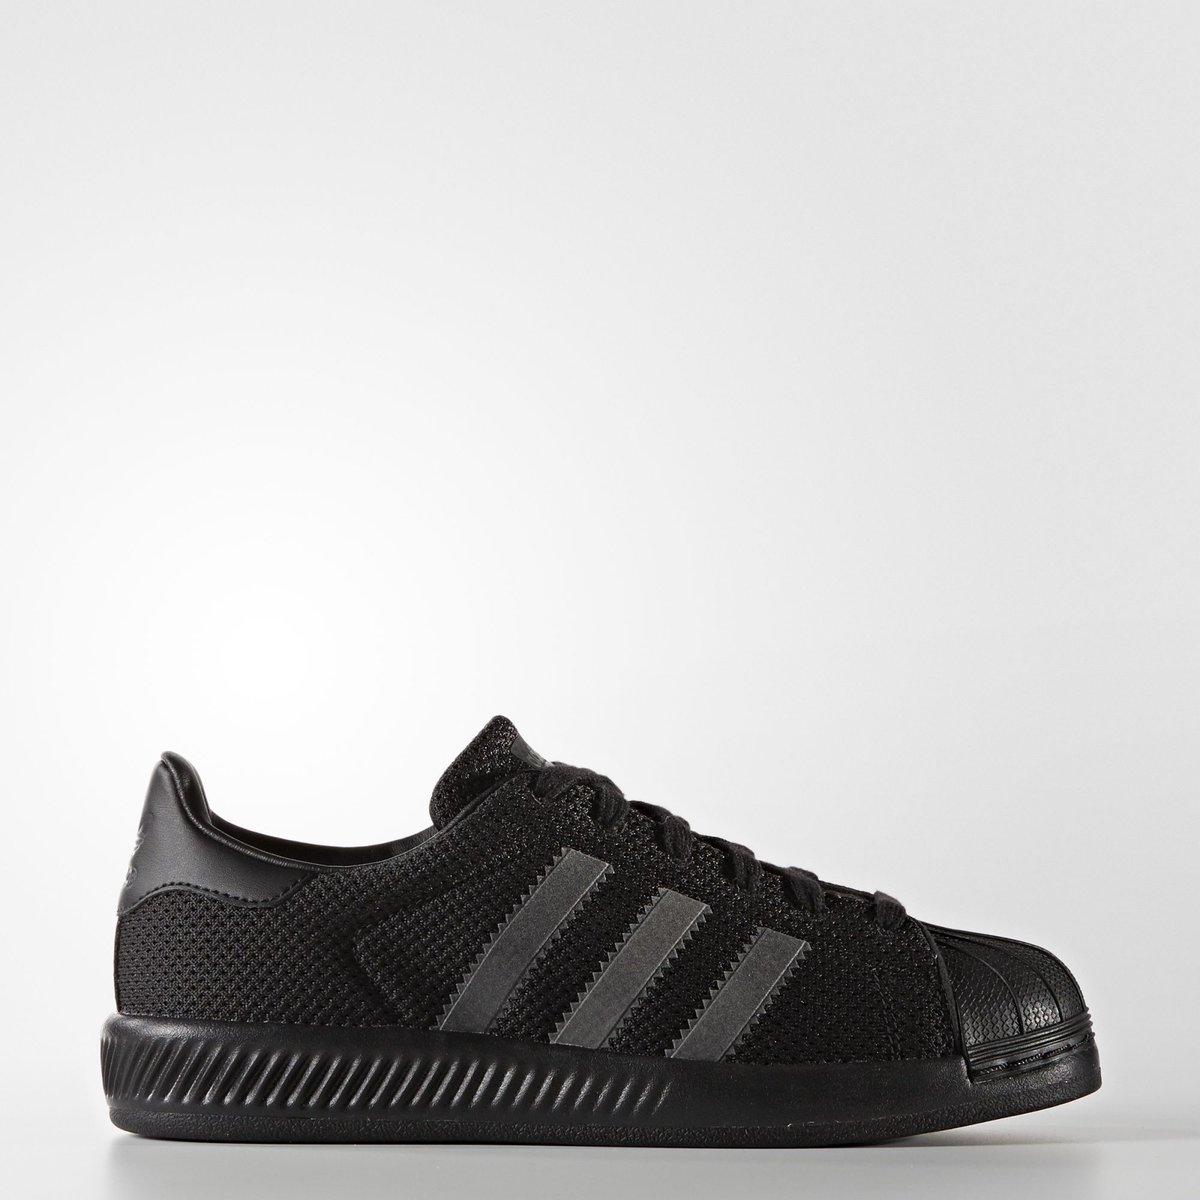 181c1a79a00bd Adidas Shoes on sale Kid s Superstar-  29.99- http   ebay.to 2nPM8em Women s  Gazelle-  29.99- http   ebay.to 2nPcVaS Women s Campus-  29.99- ...